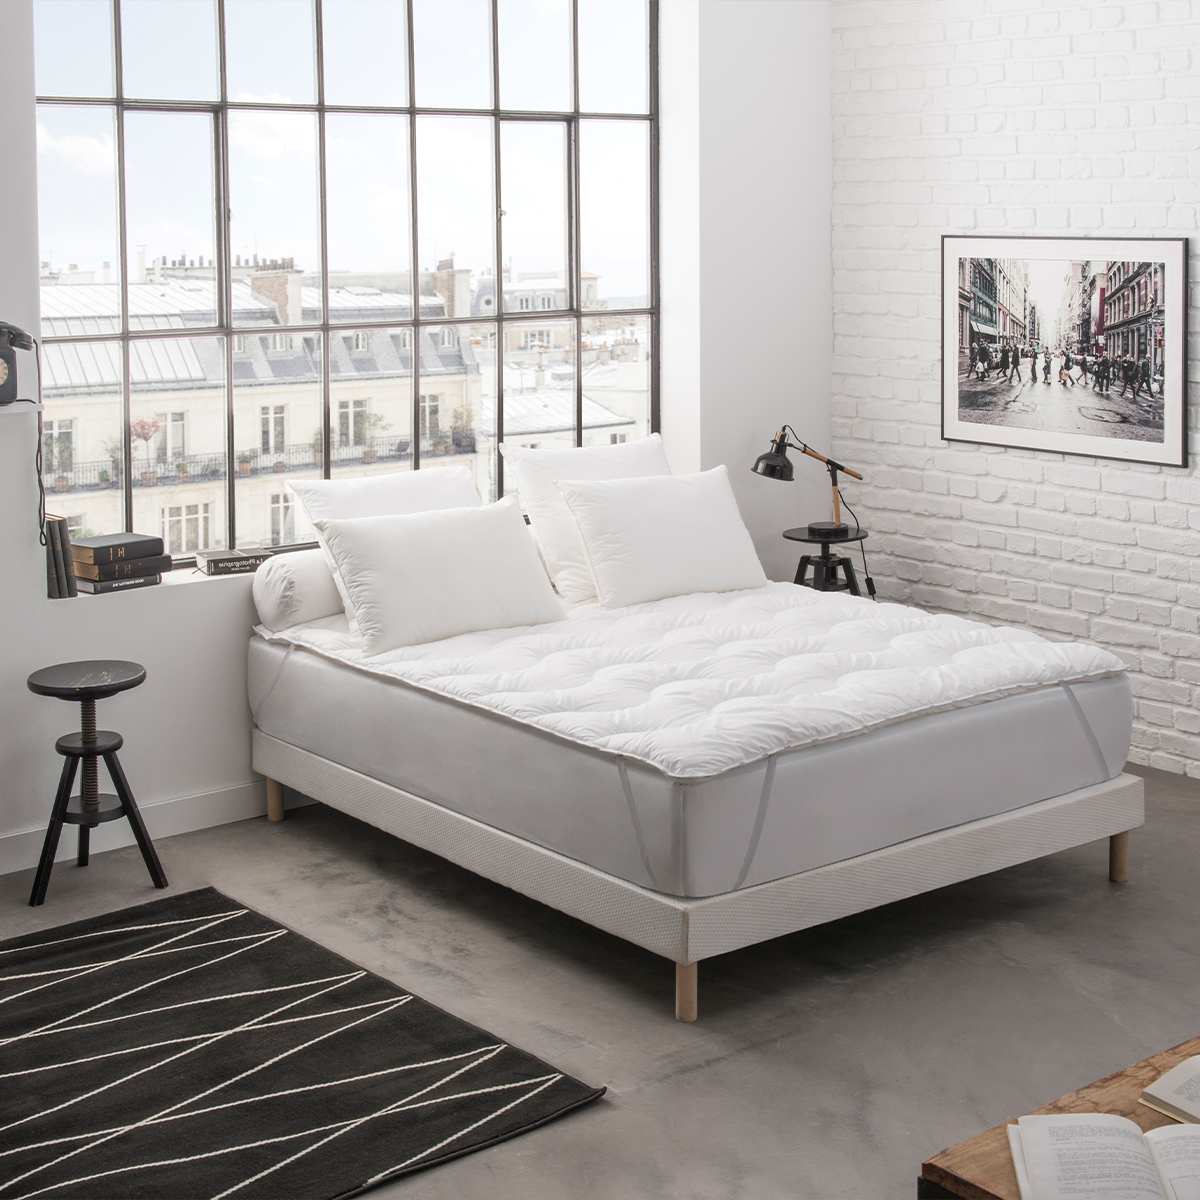 Surmatelas Surconfort® Ultra Confort 90x190 cm